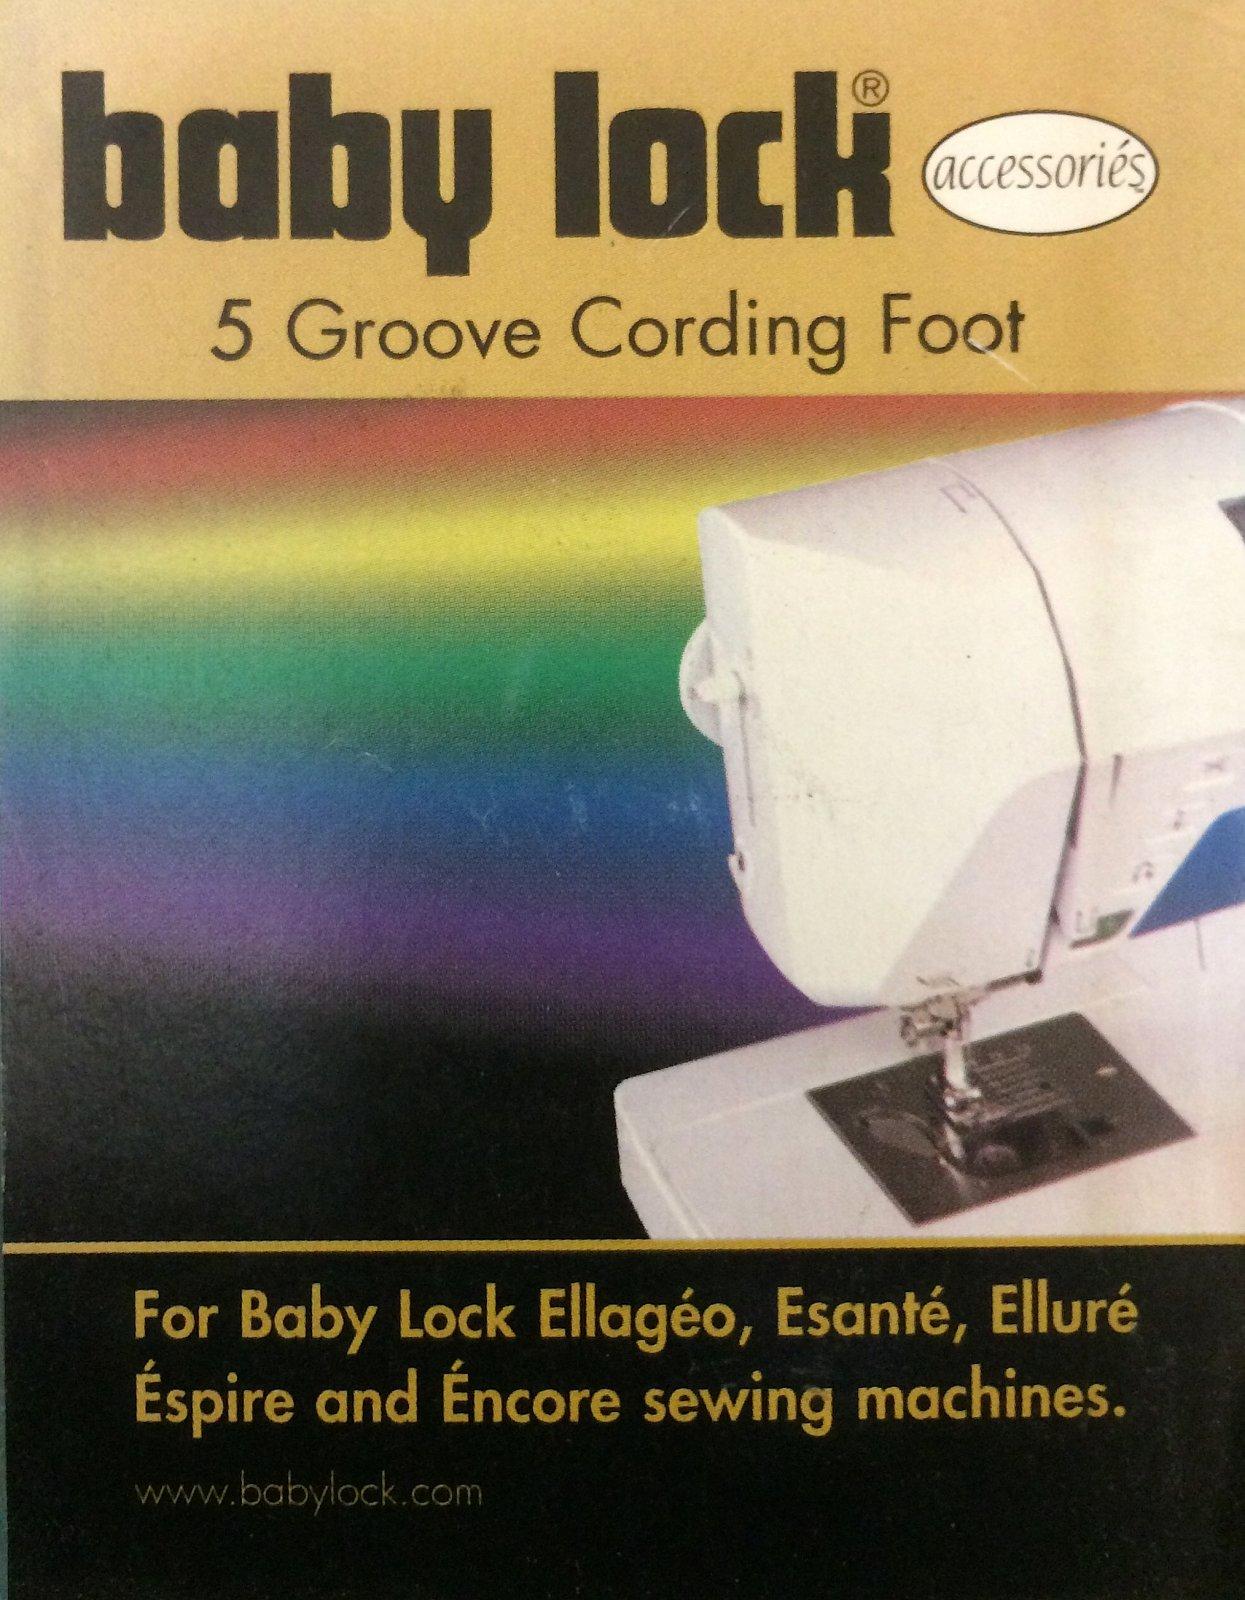 5 Groove Cording Foot